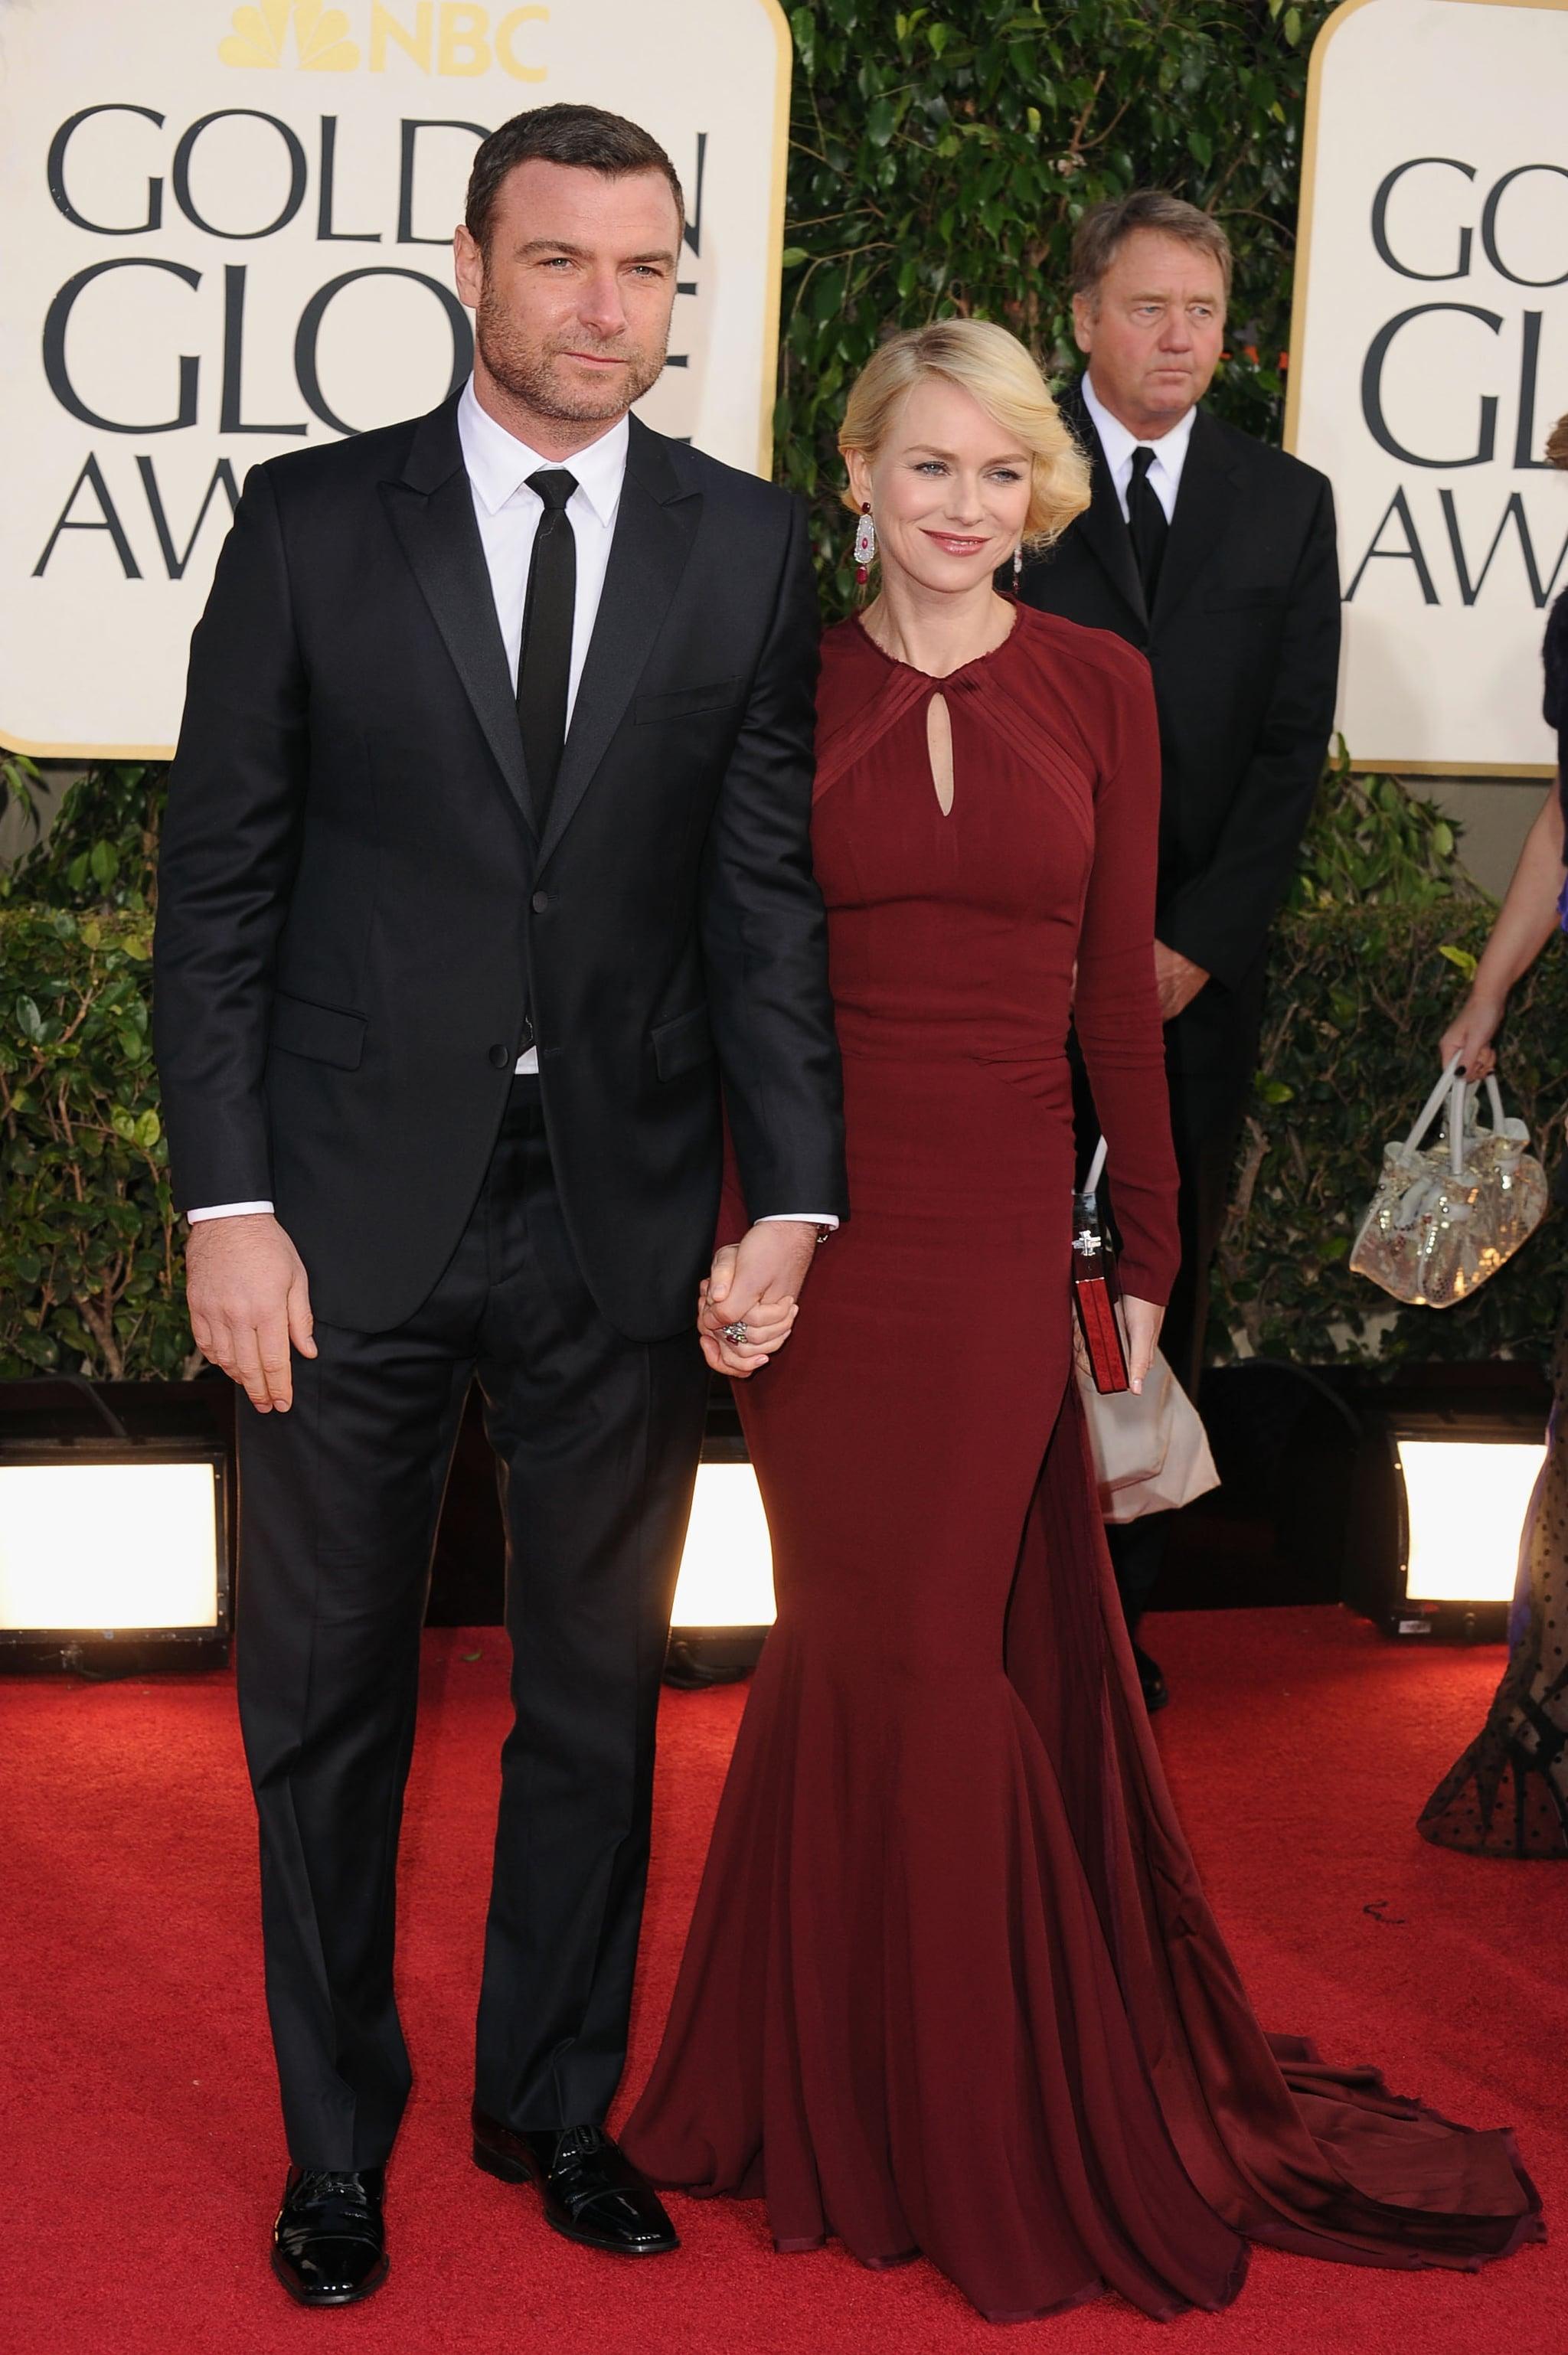 Liev Schreiber and Naomi Watts | Star Couples Sparkle at ...